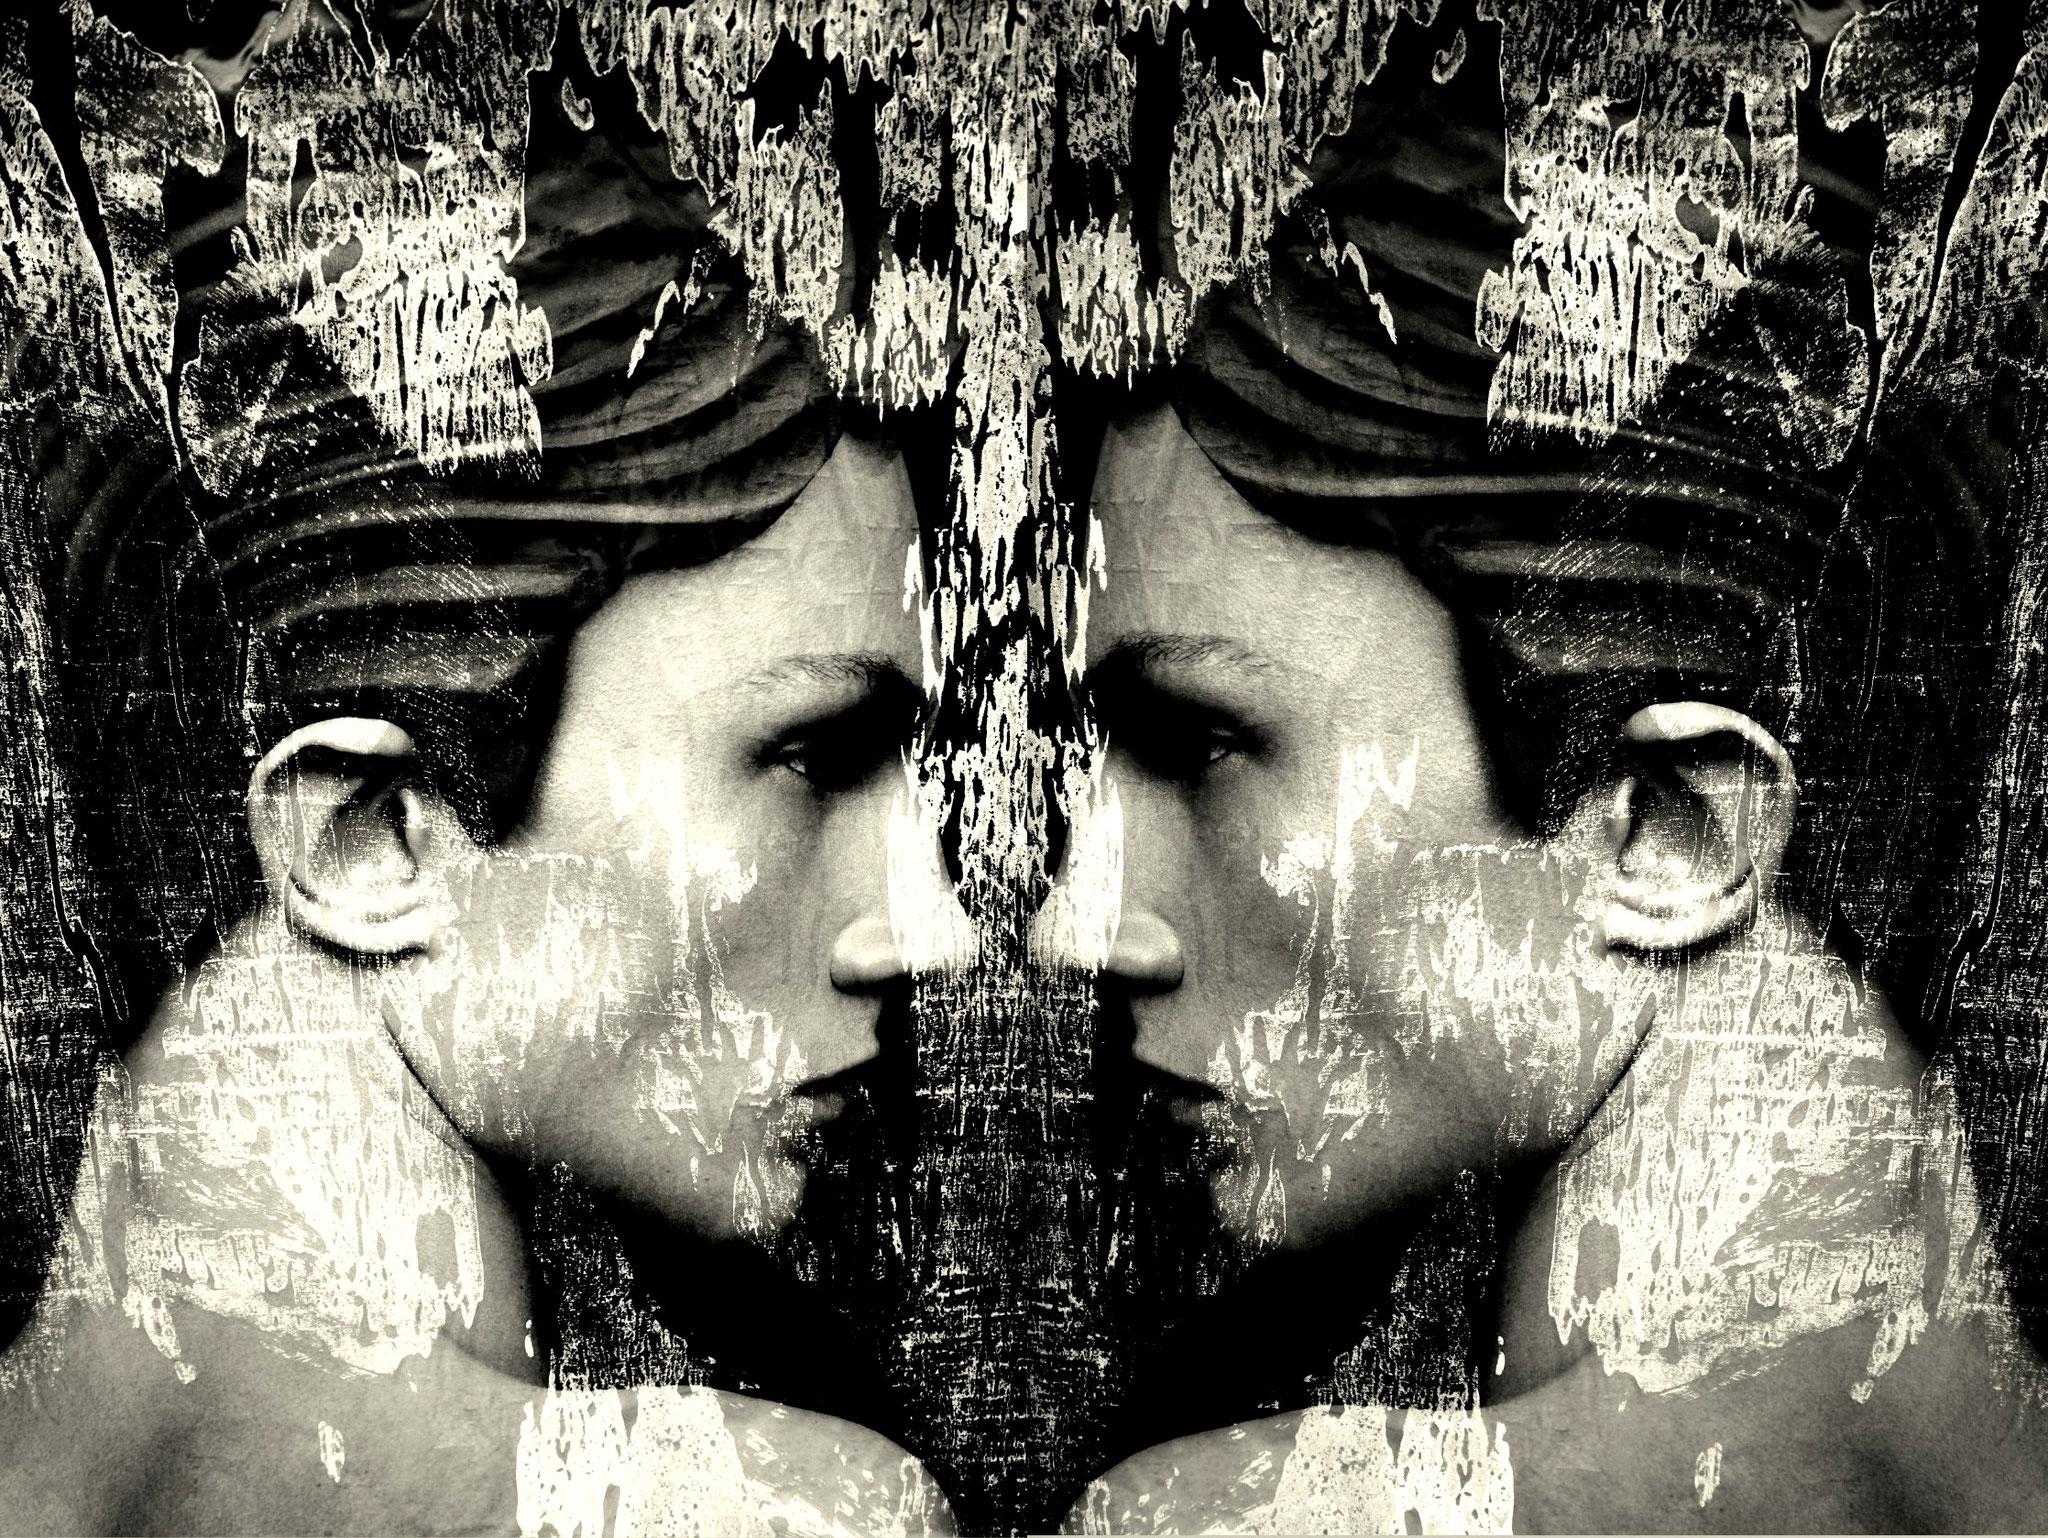 """Augenblick""100x90cm/Digital Art auf Alu -Dibond"